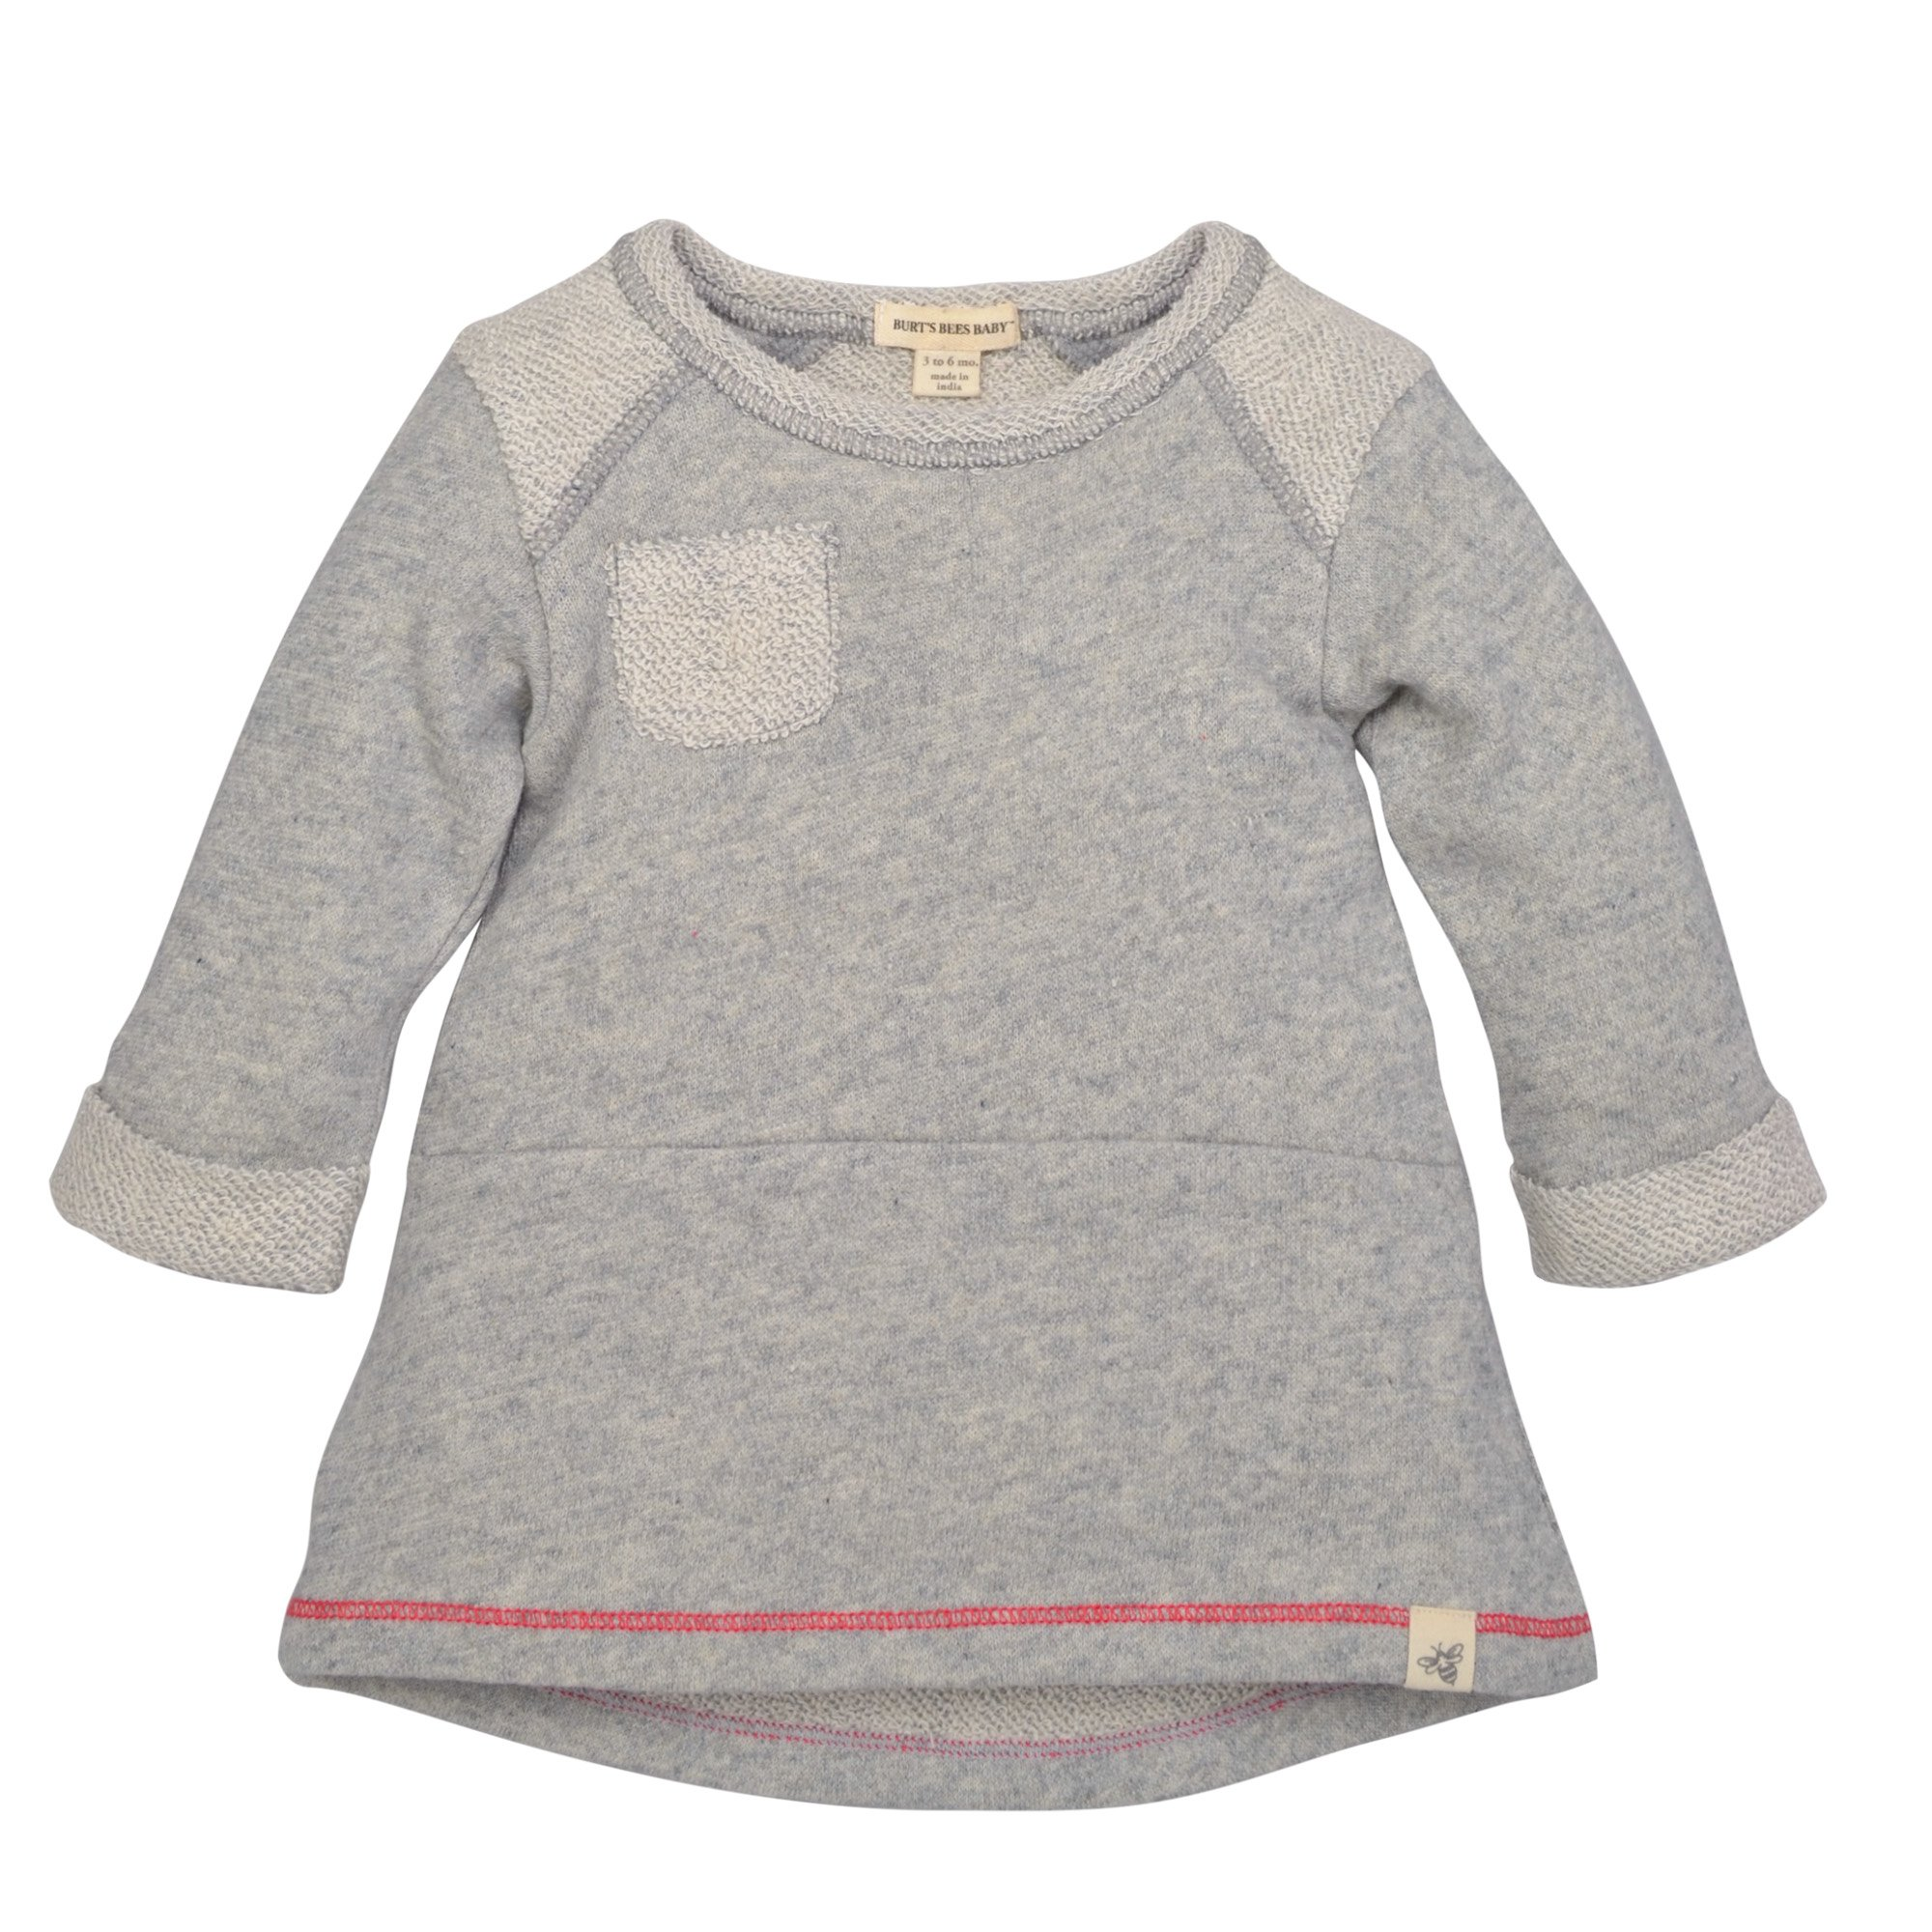 Burt's Bees Baby - Baby Girl's Dress, Infant & Toddler, Short & Long-Sleeve, 100% Organic Cotton